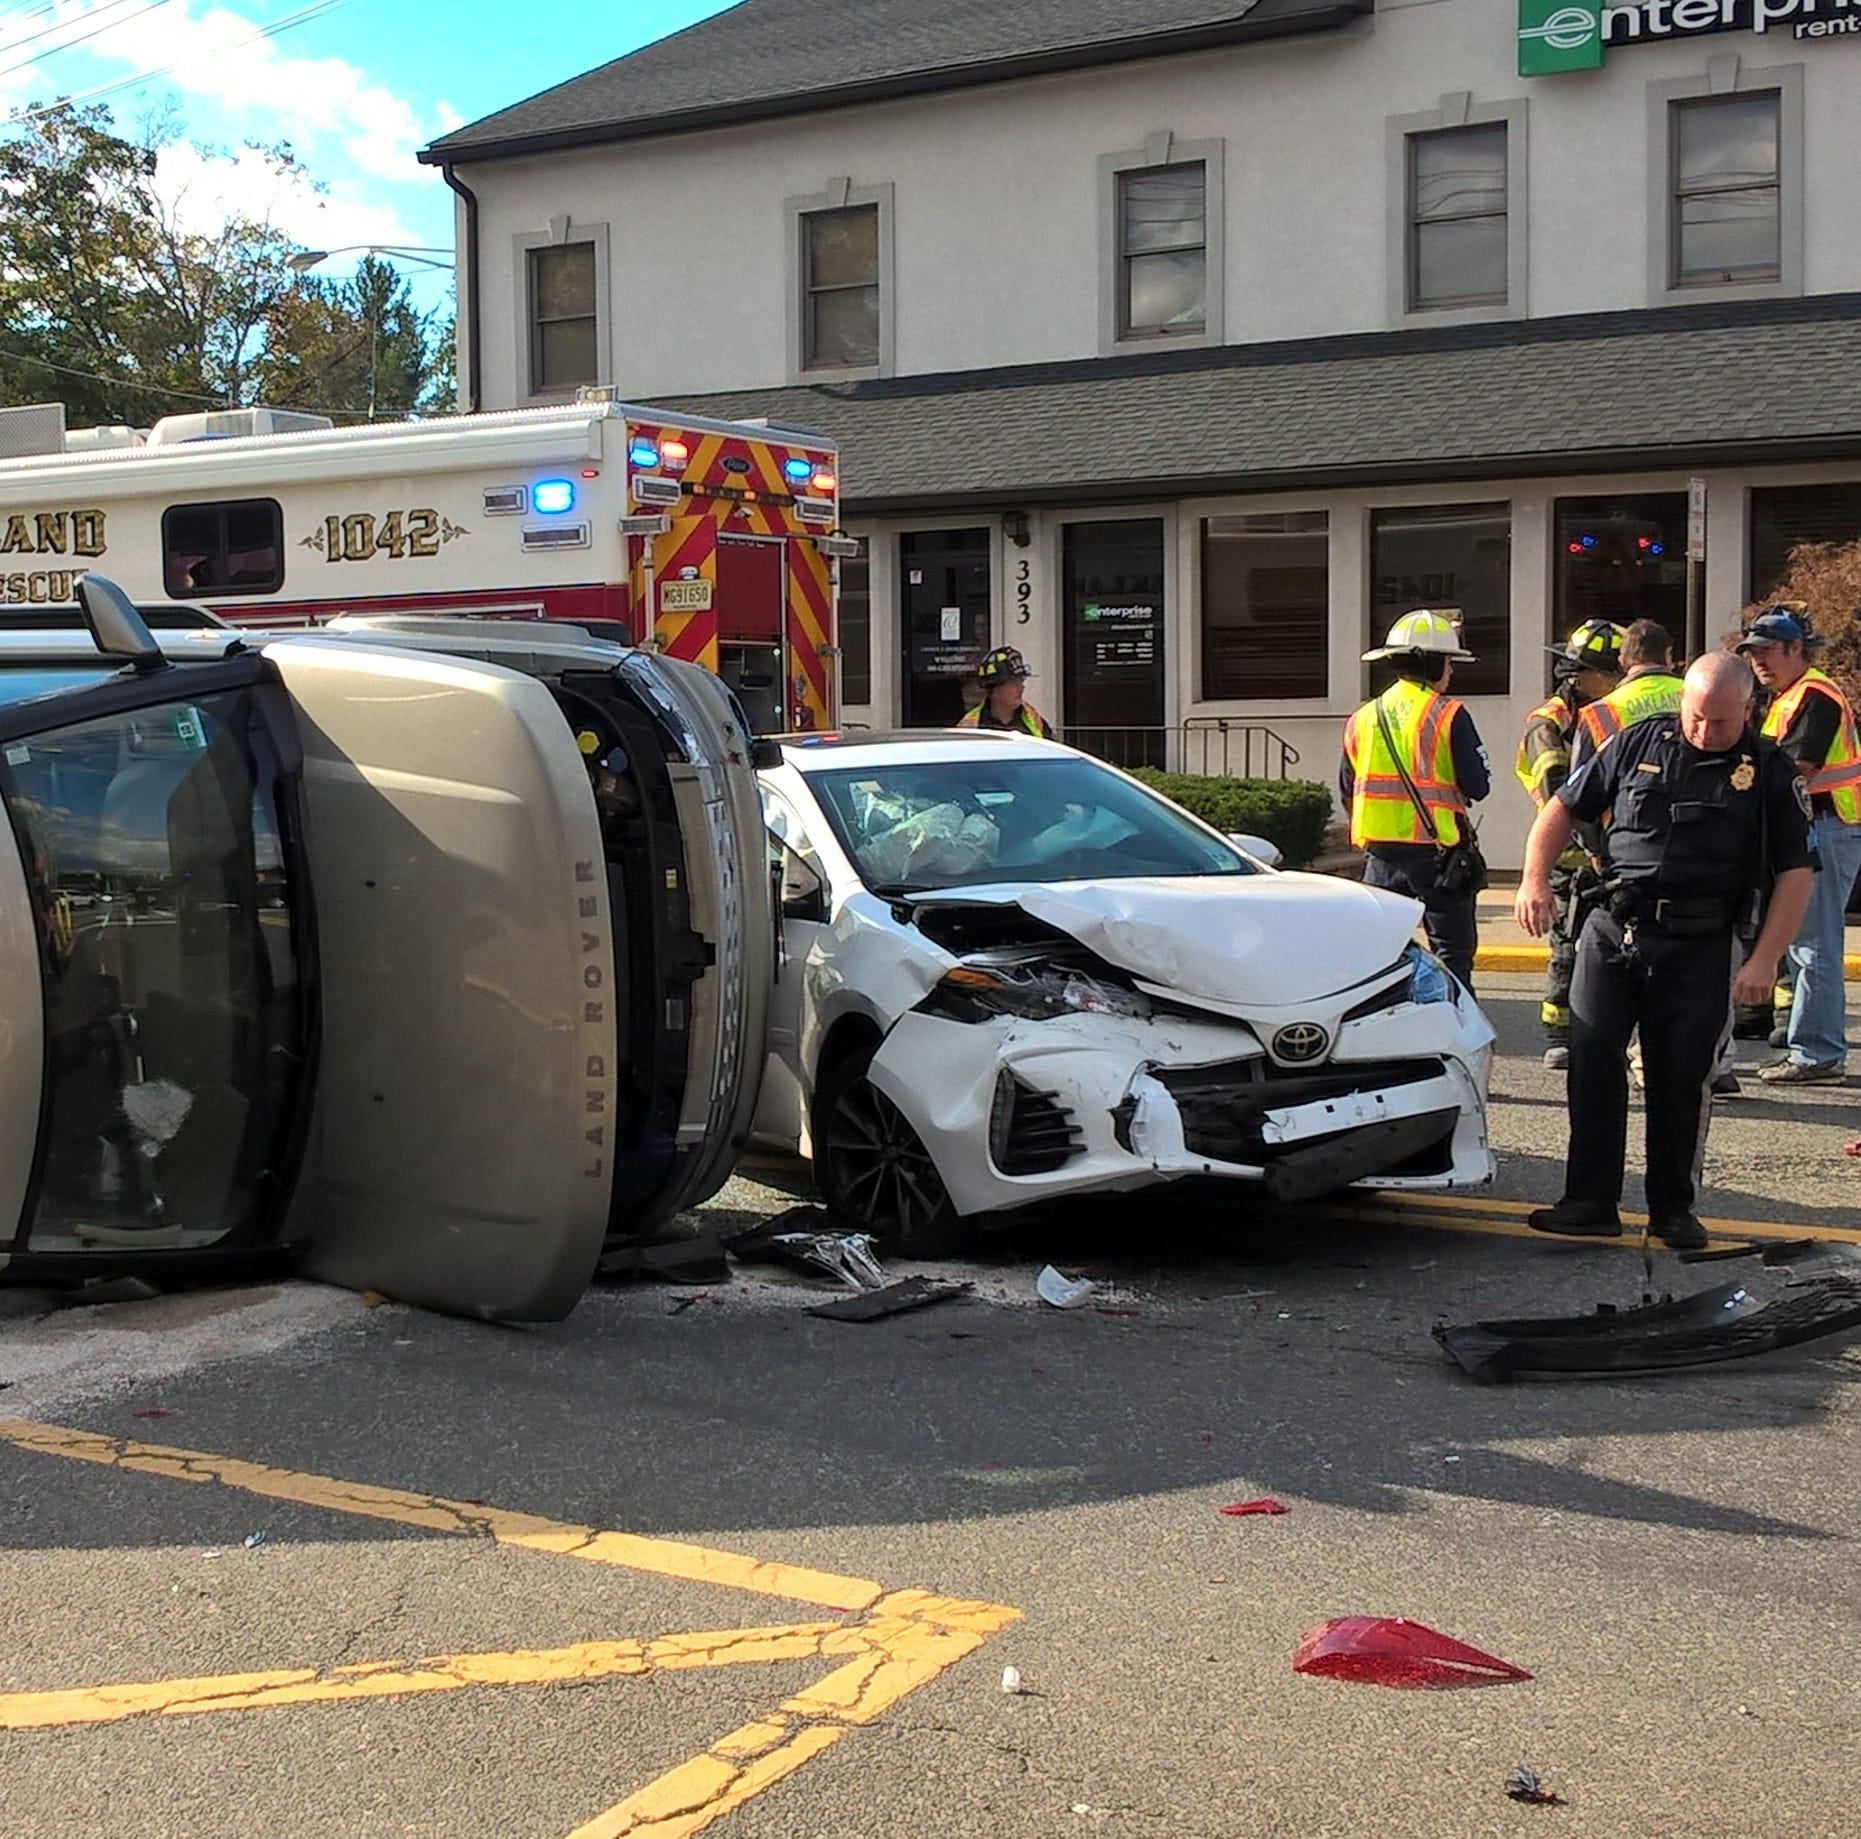 Vehicle overturns in Oakland crash